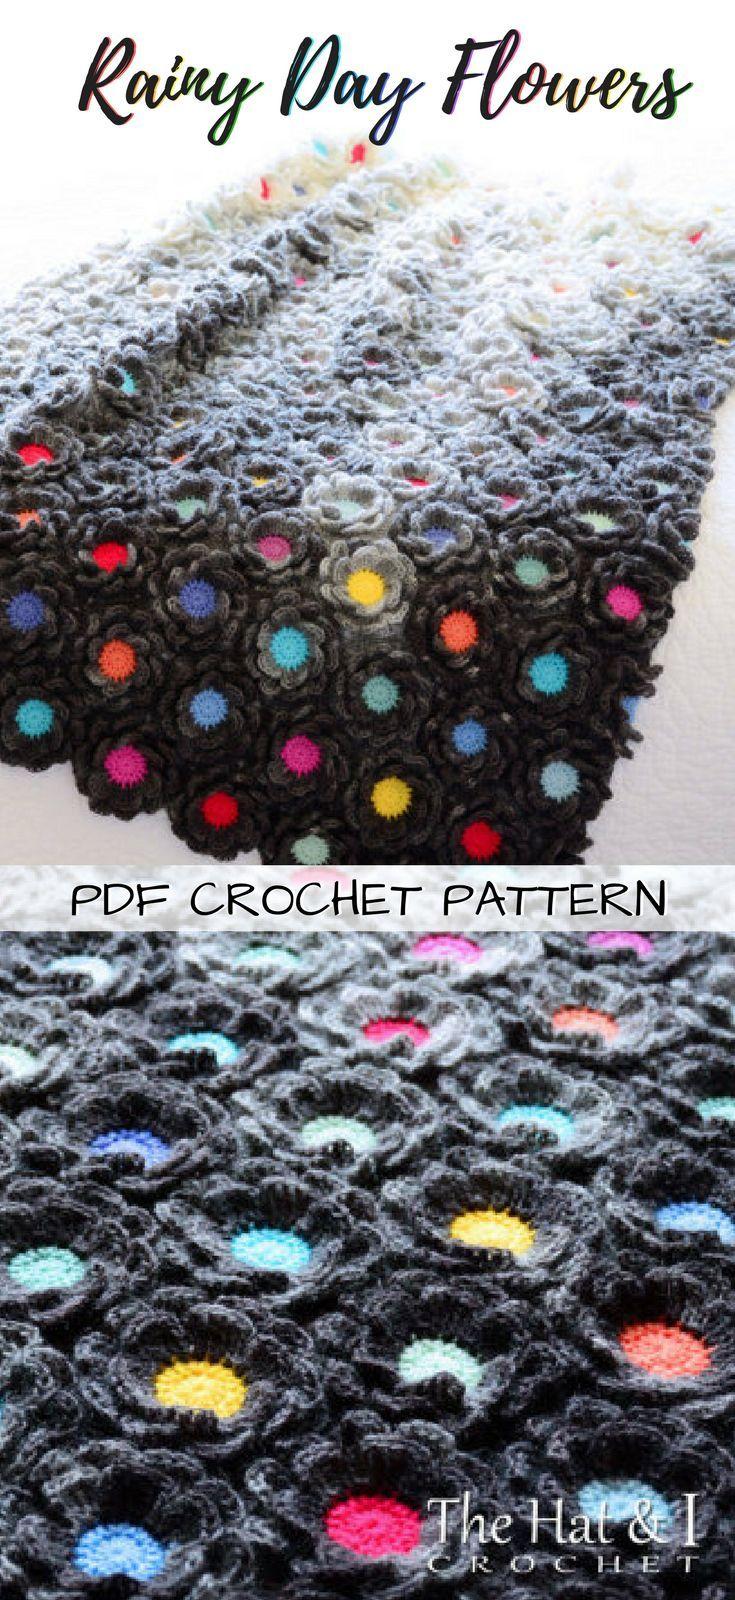 Unique -!- | Crochet | Pinterest | Crochet afghan patterns, Afghan ...